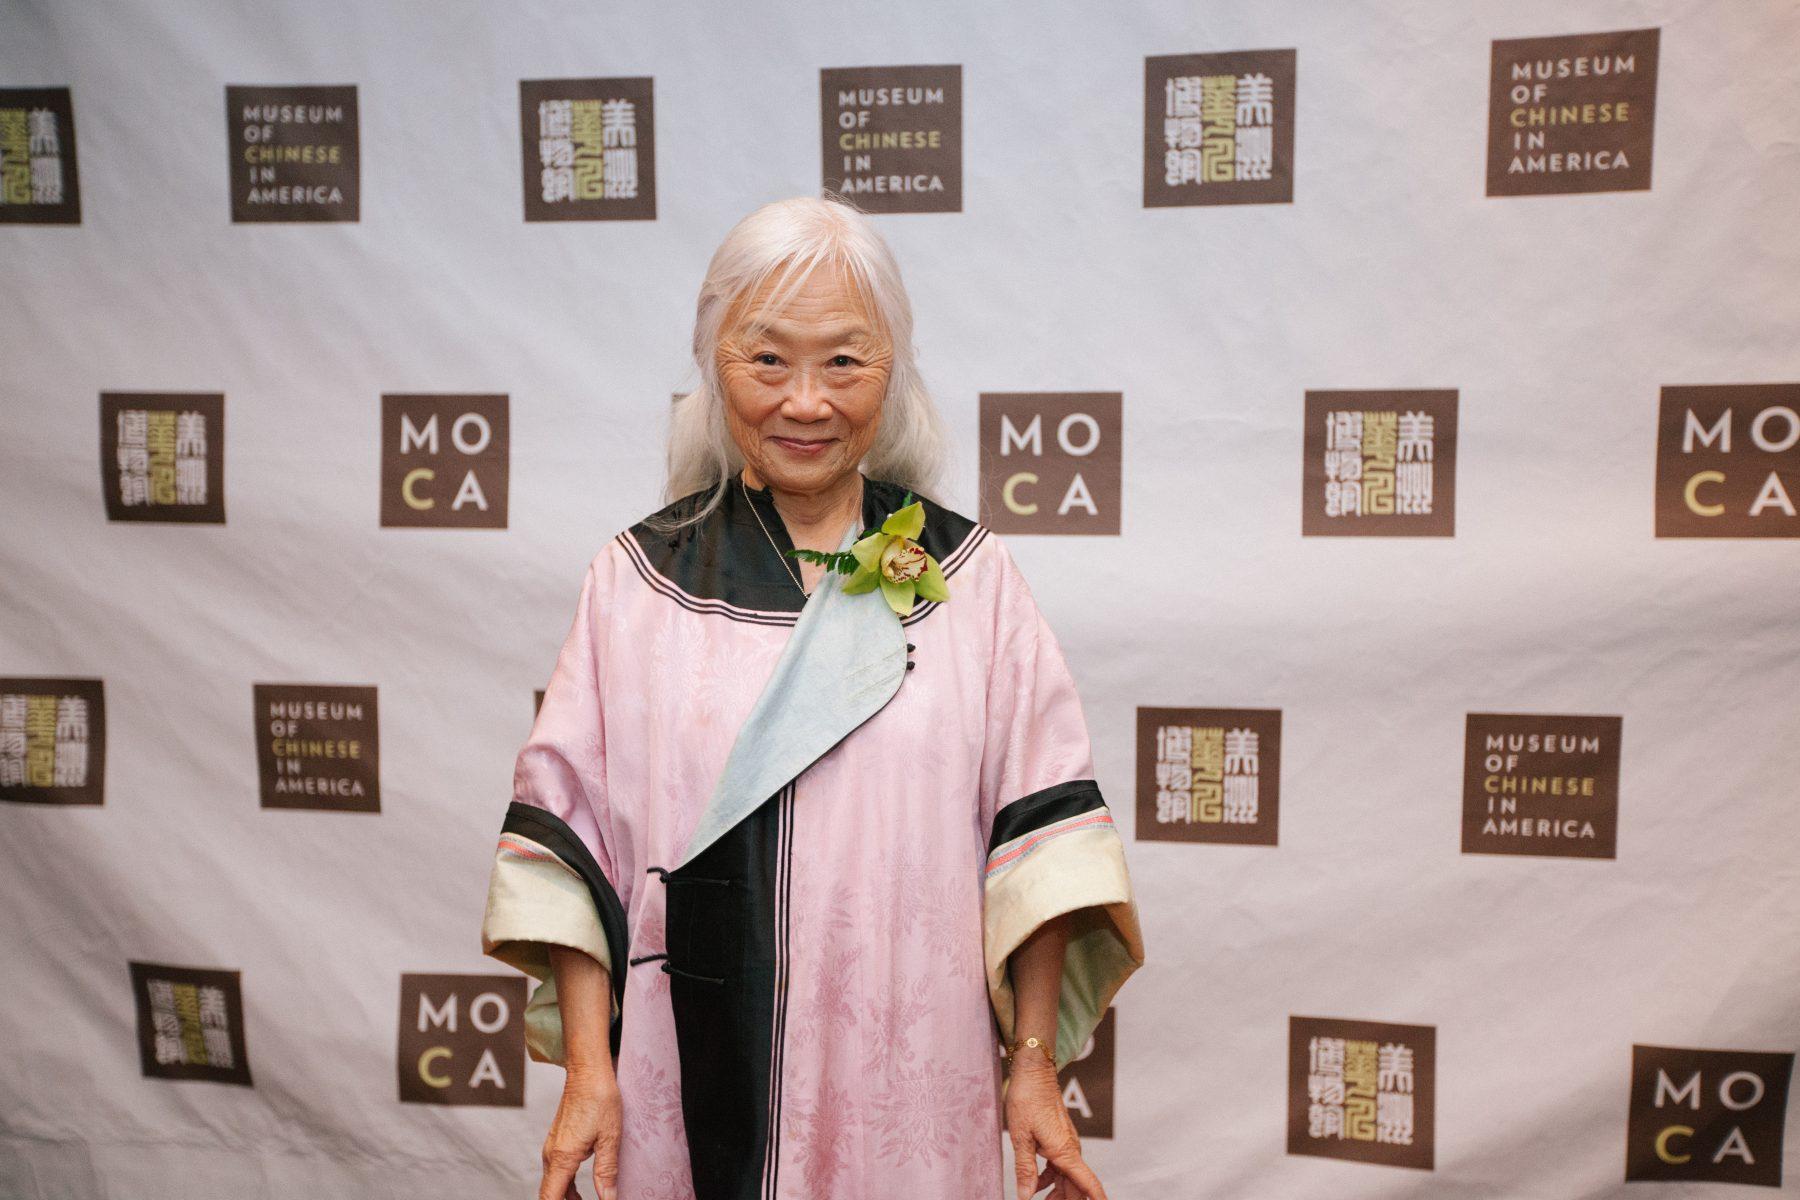 15 October 2019 Posted. Maxine Hong Kingston at MOCA's 2018 Gala, Museum of Chinese in America (MOCA) Institutional Archives. 汤婷婷在2018年MOCA年度传承大奖颁奖晚宴上,美国华人博物馆(MOCA)机构档案